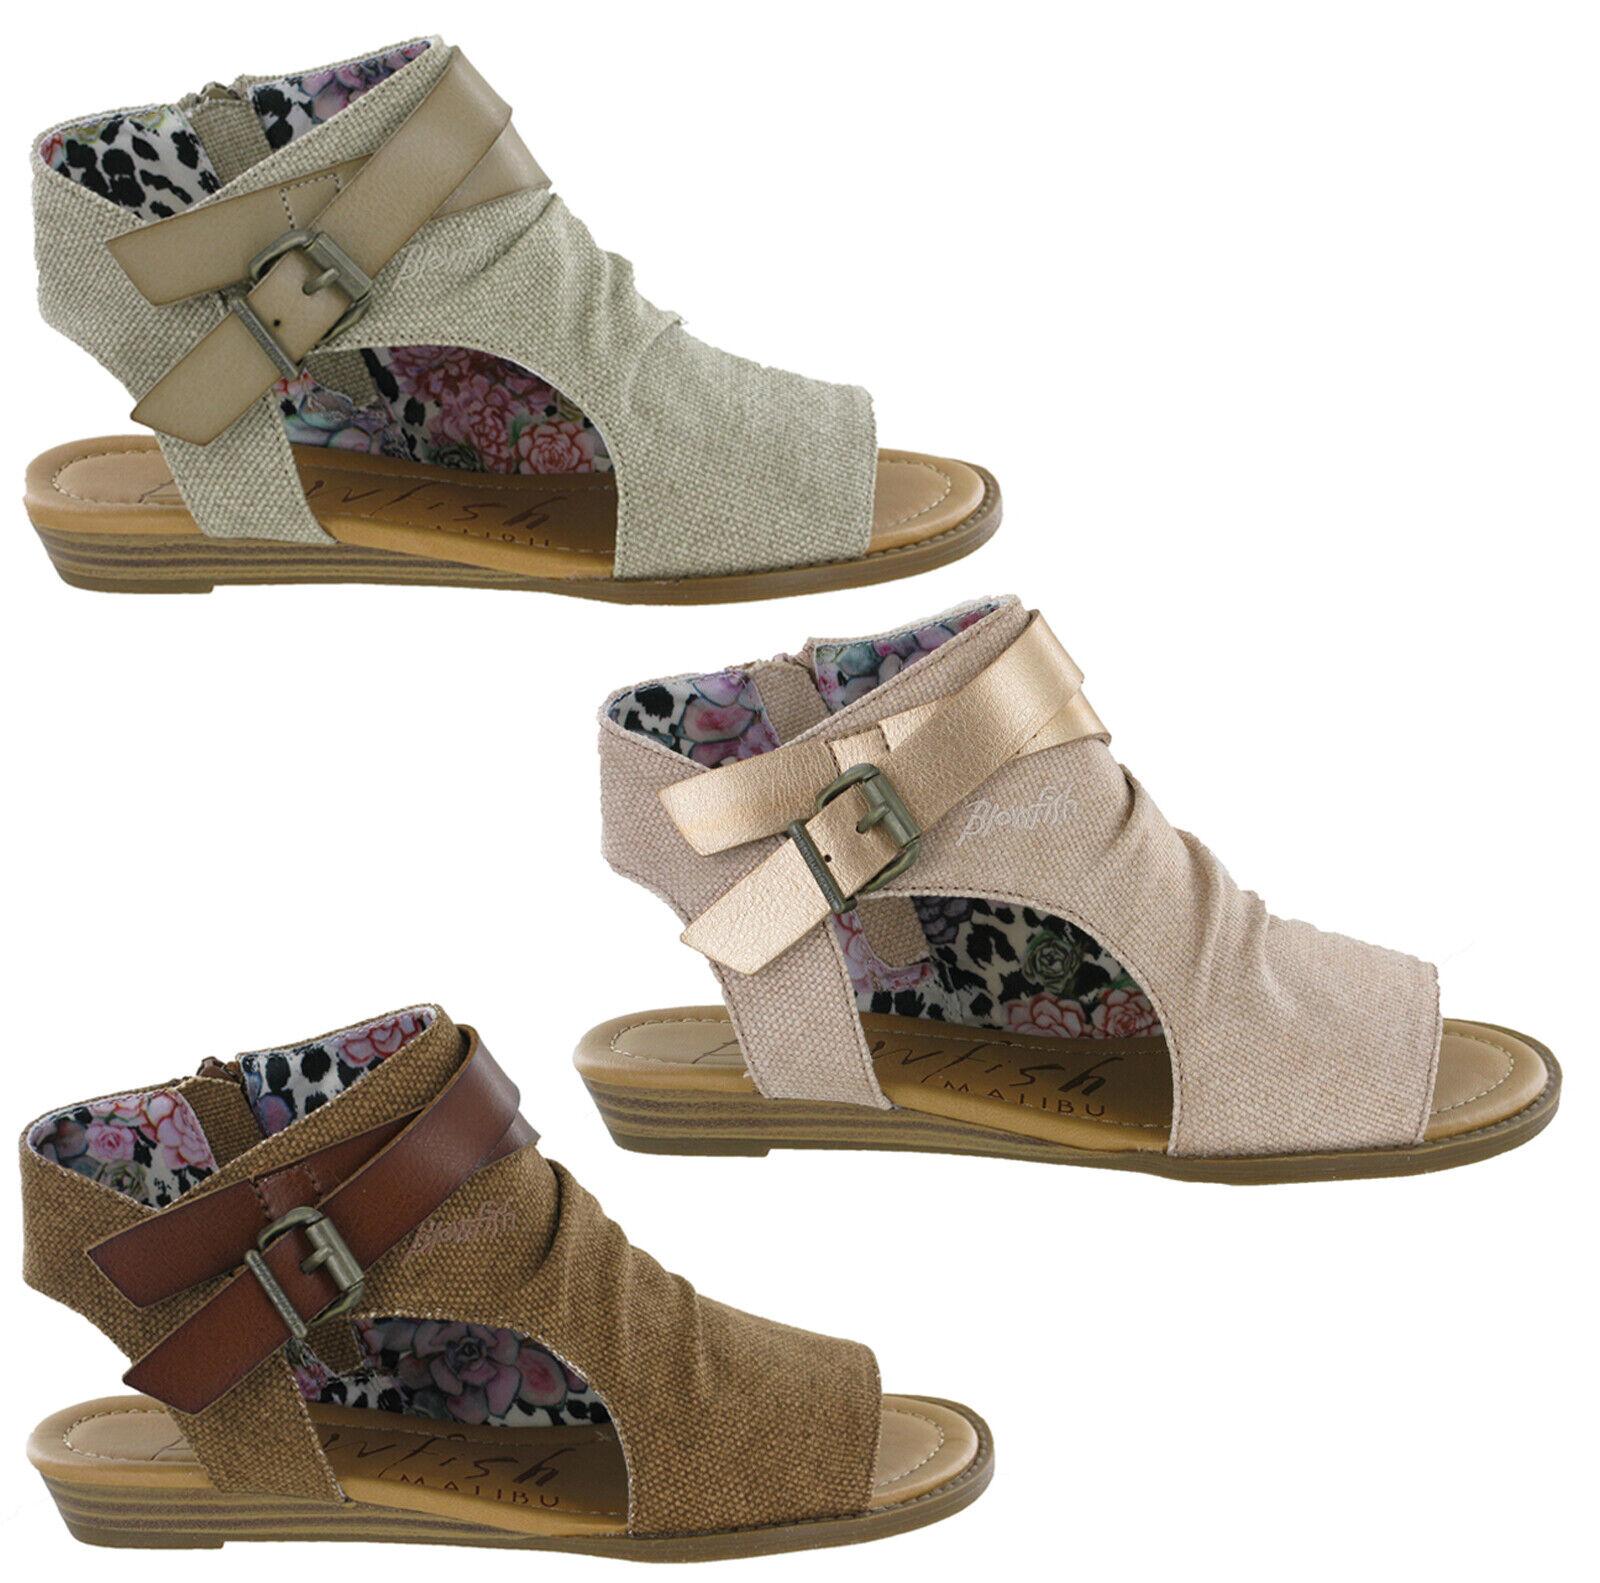 Blowfish Balla Flat Sandals Womens Open Toe Fashion Casual Zip Up Ladies shoes